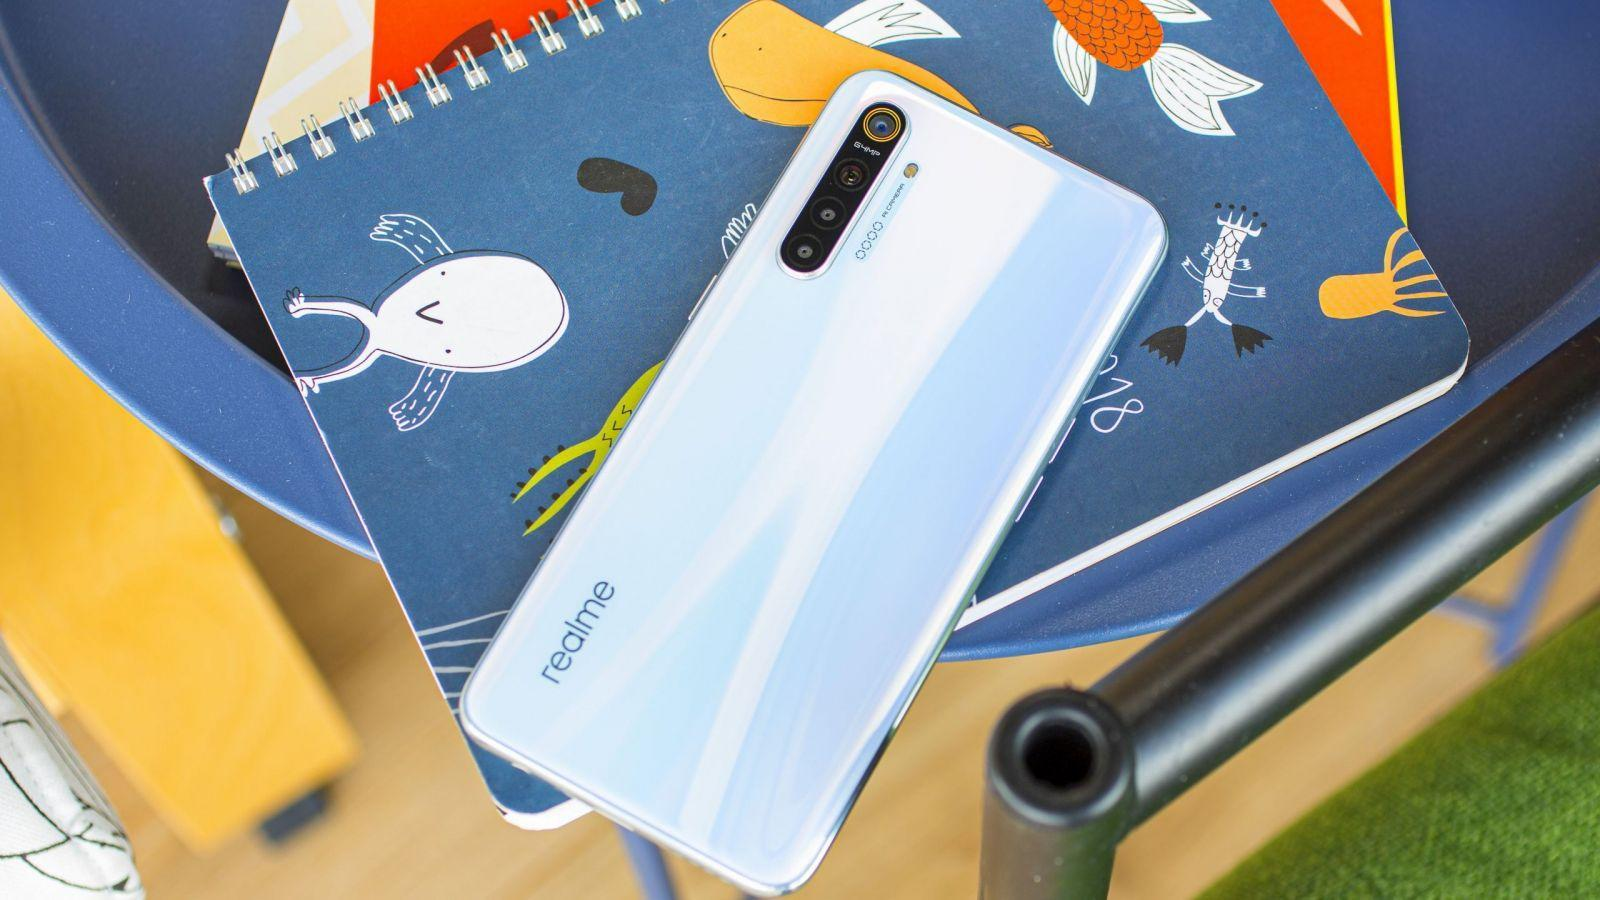 Realme X3 SuperZoom будет поставляться с 4200 мАч аккумулятором и быстрой зарядкой (Realme X3 Super Zoom new specs leaked scaled)